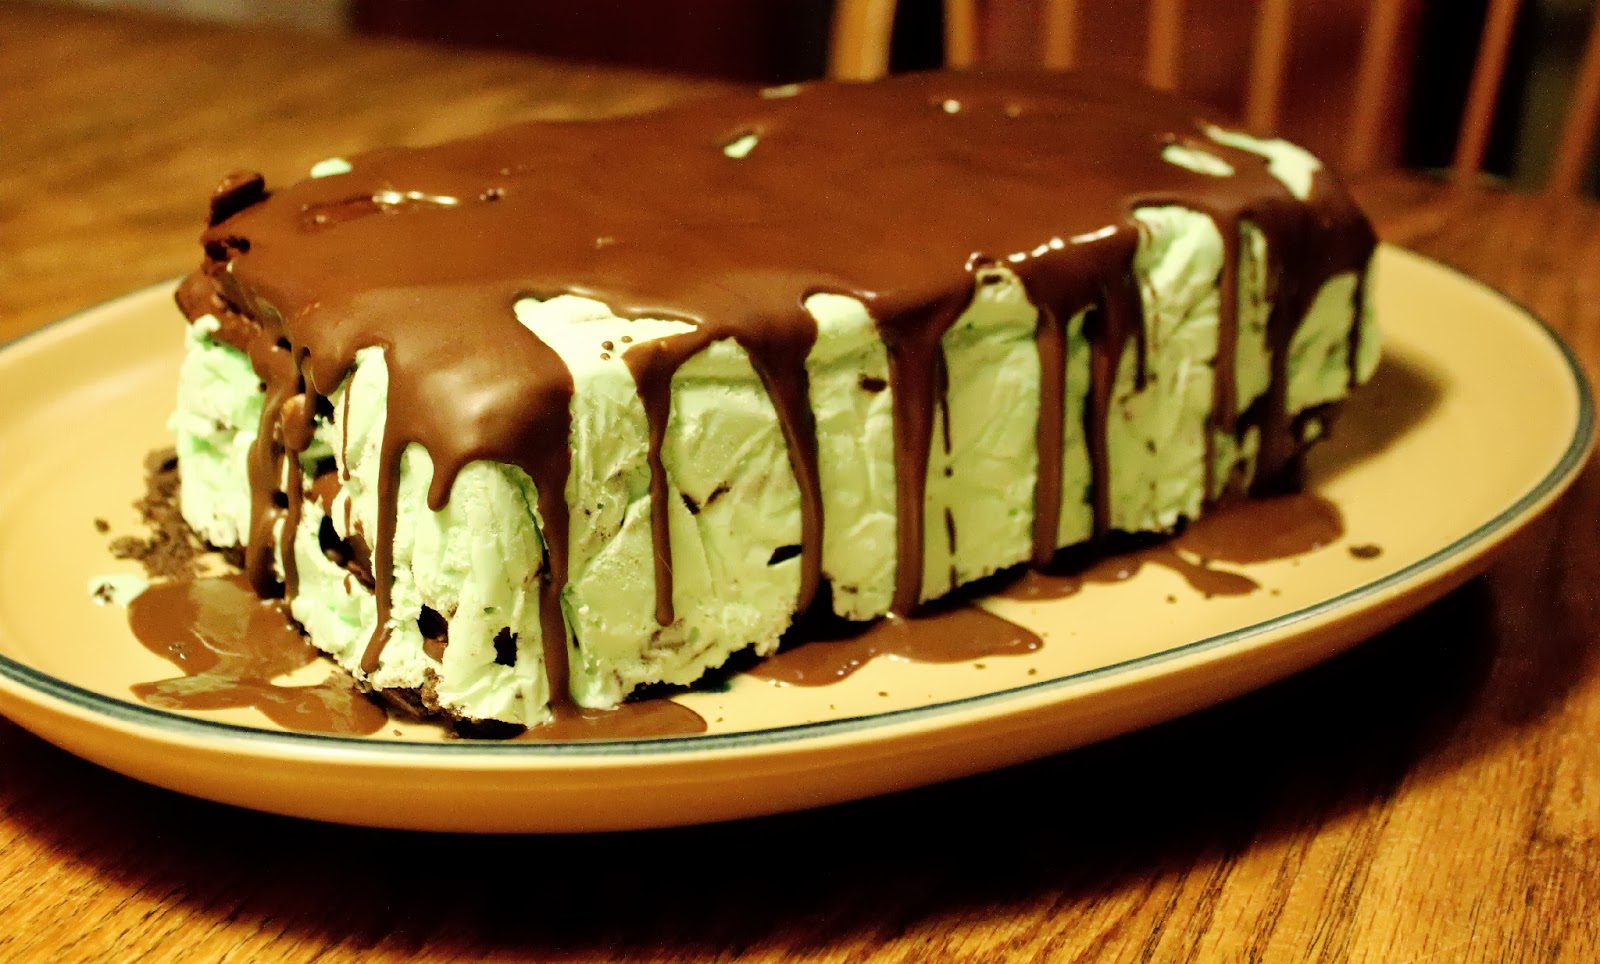 The Boots Parade Homemade Ice Cream Cake